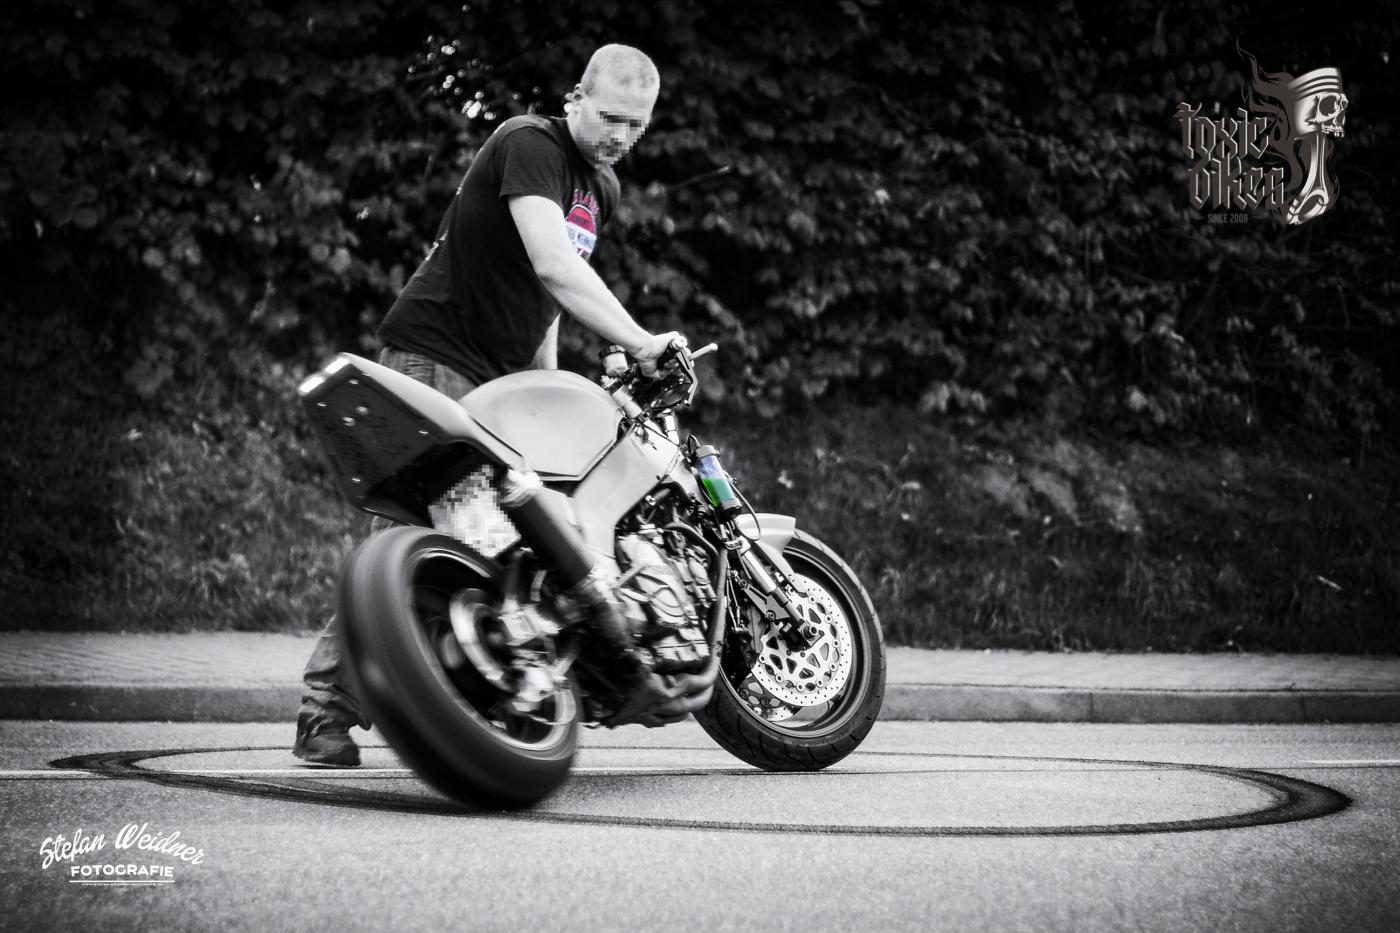 c-Stefan-Weidner-Fotografie_Toxic-Bikes-Hohenfelde_15-08-2015_IMG_3999.jpg